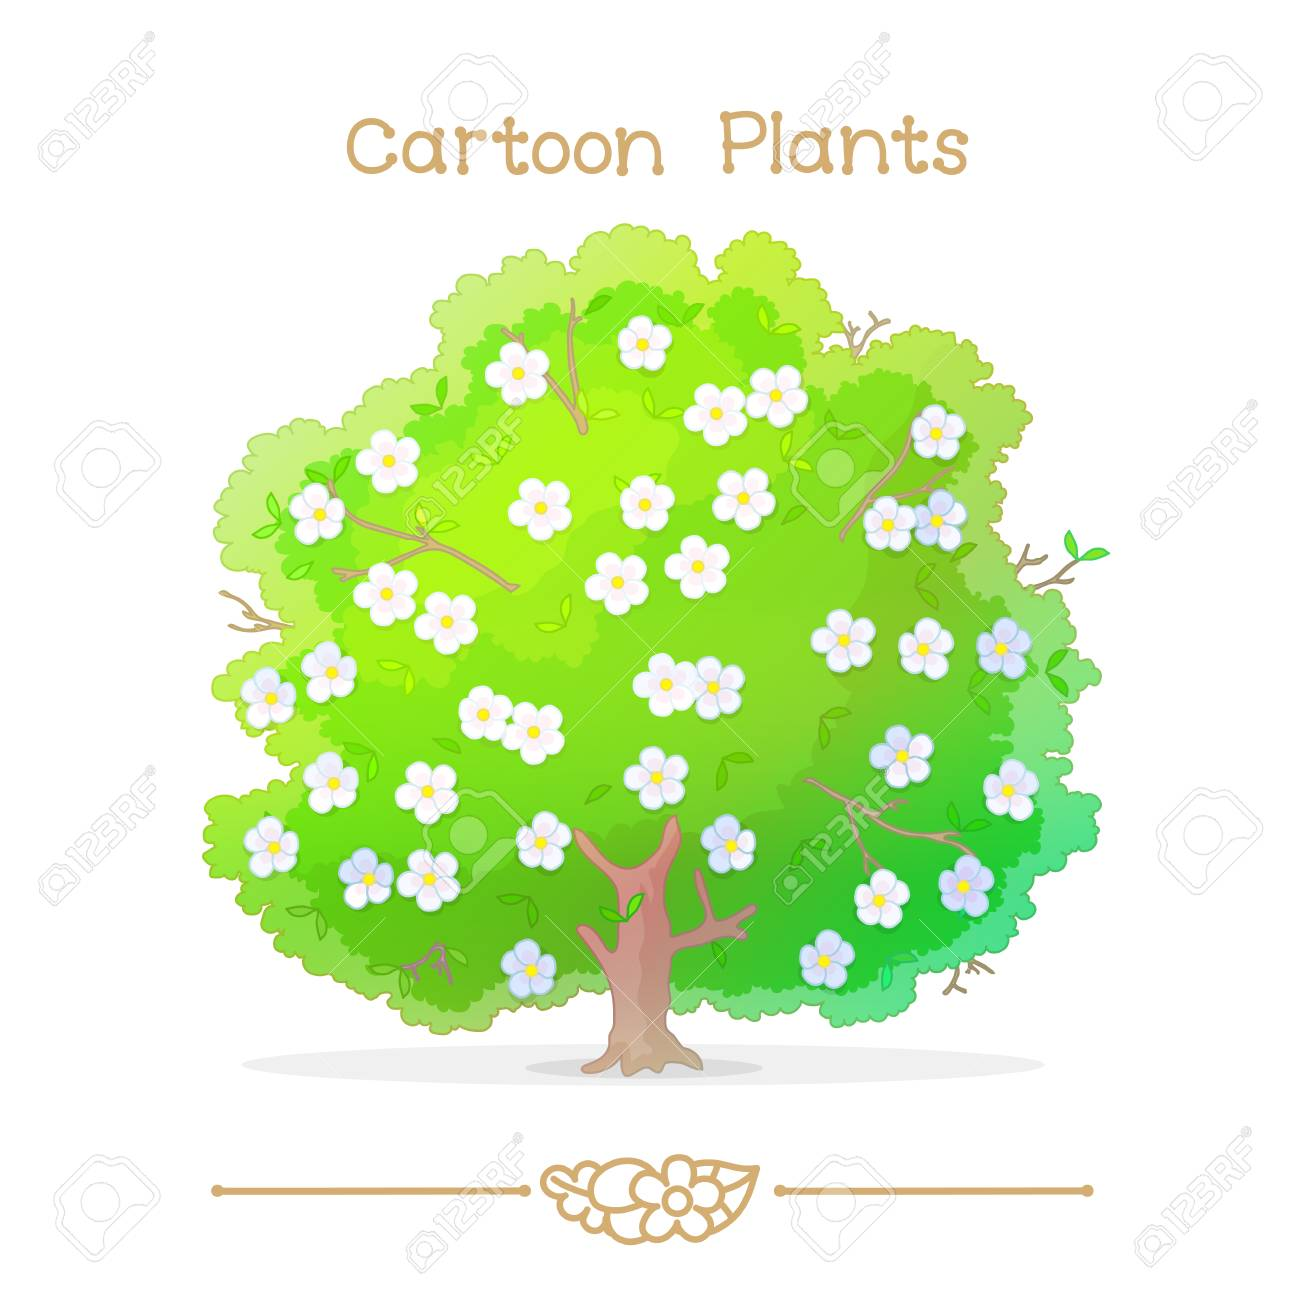 Illustration Sammlung Cartoon Pflanzen Frühling Blühender Baum